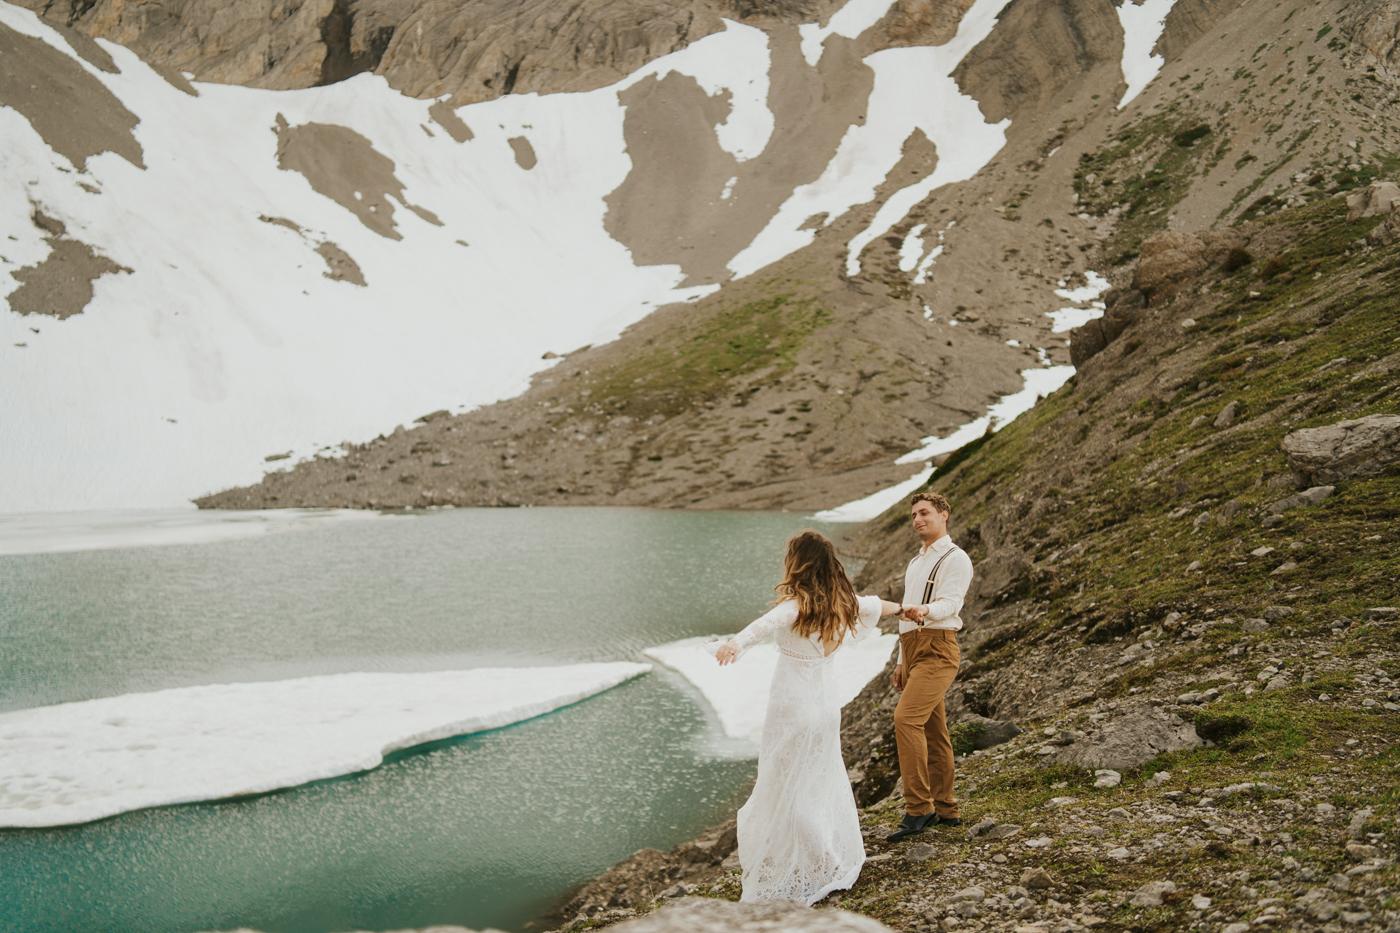 tyraephotography_photographer_wedding_elopement_engagement_photography-07663.jpg